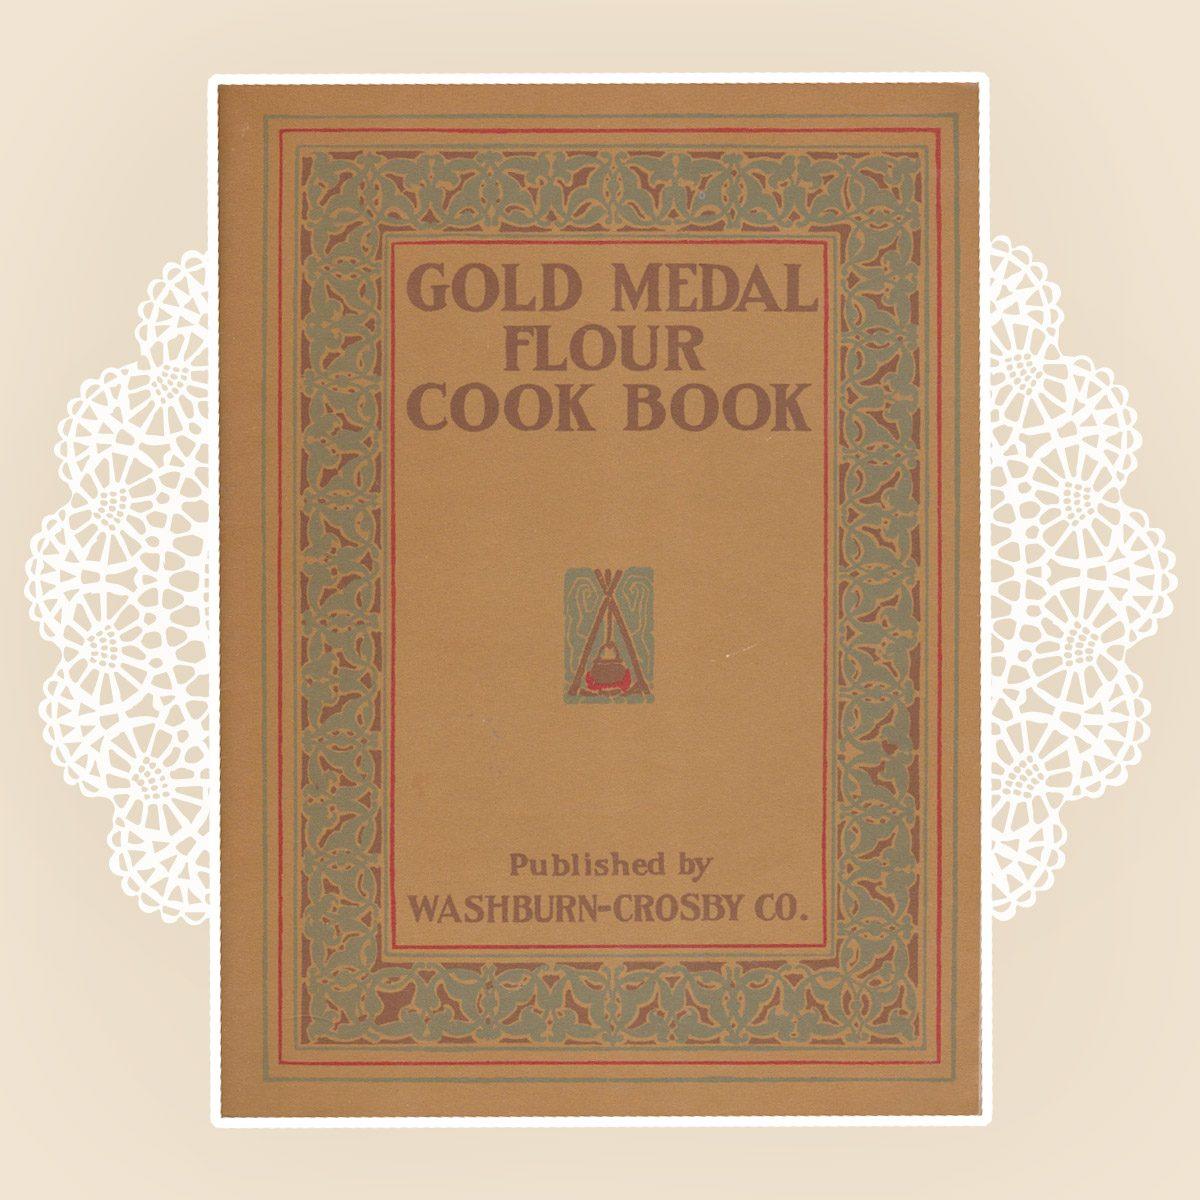 Gold Medal Flour Cook Book 1910 Edition